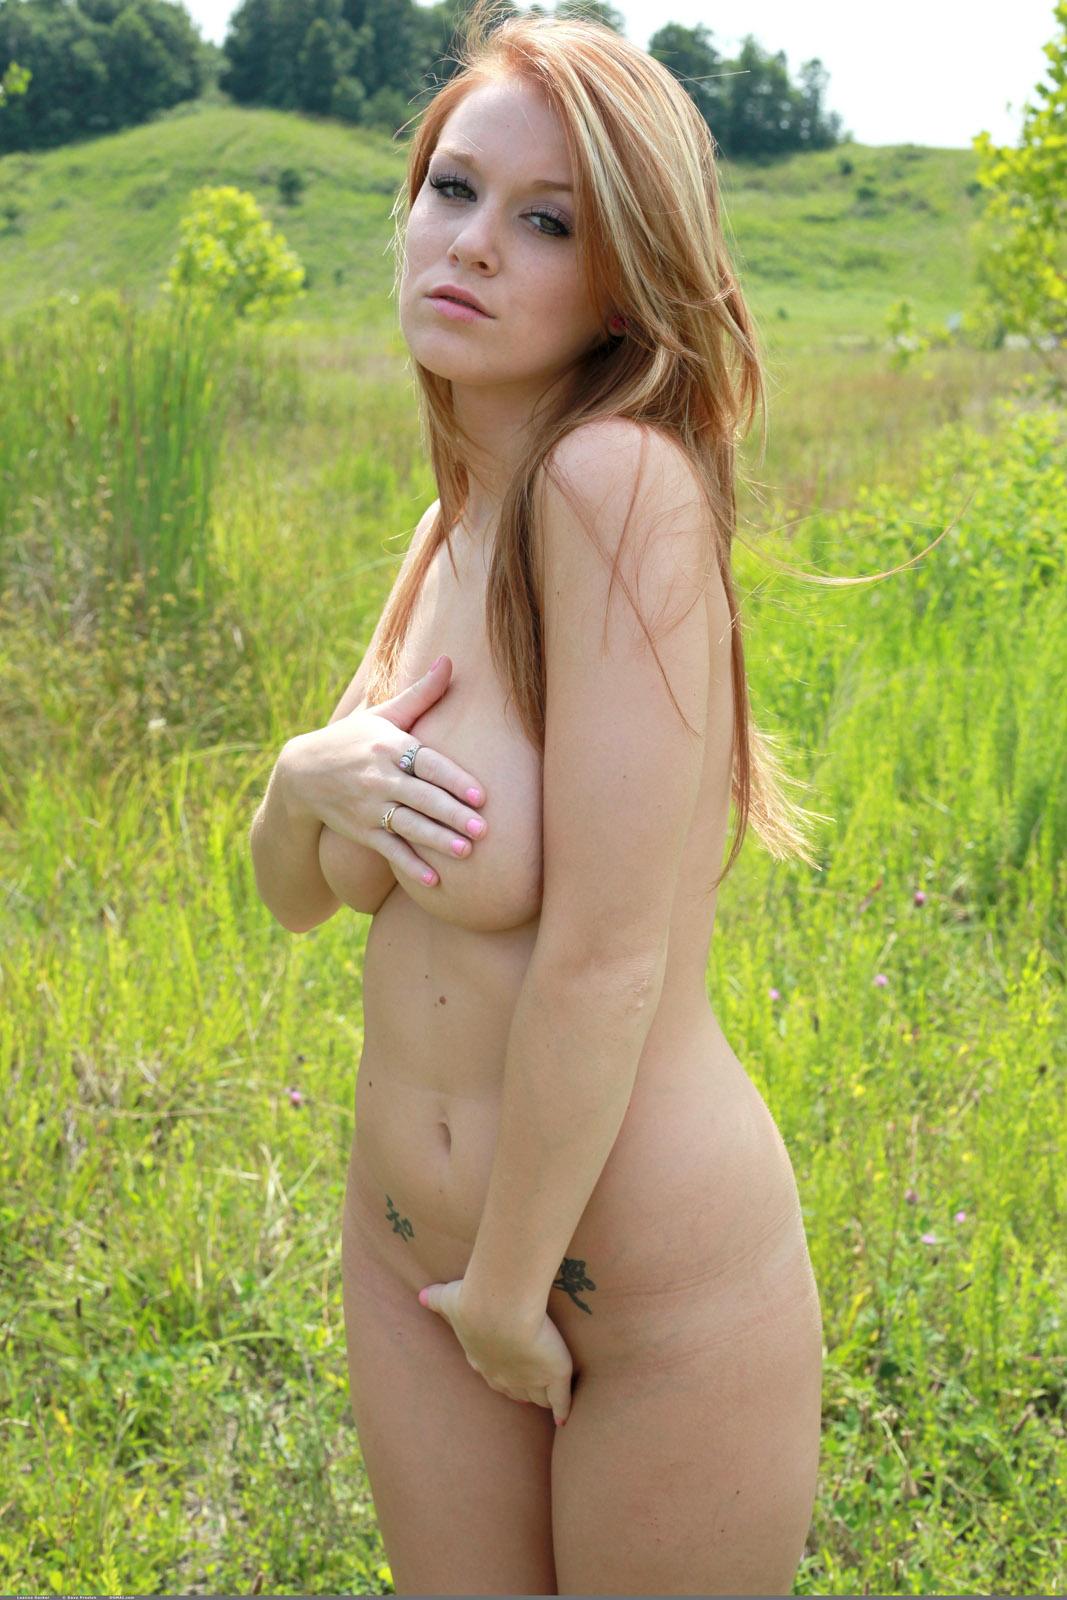 Domai erotic redheads